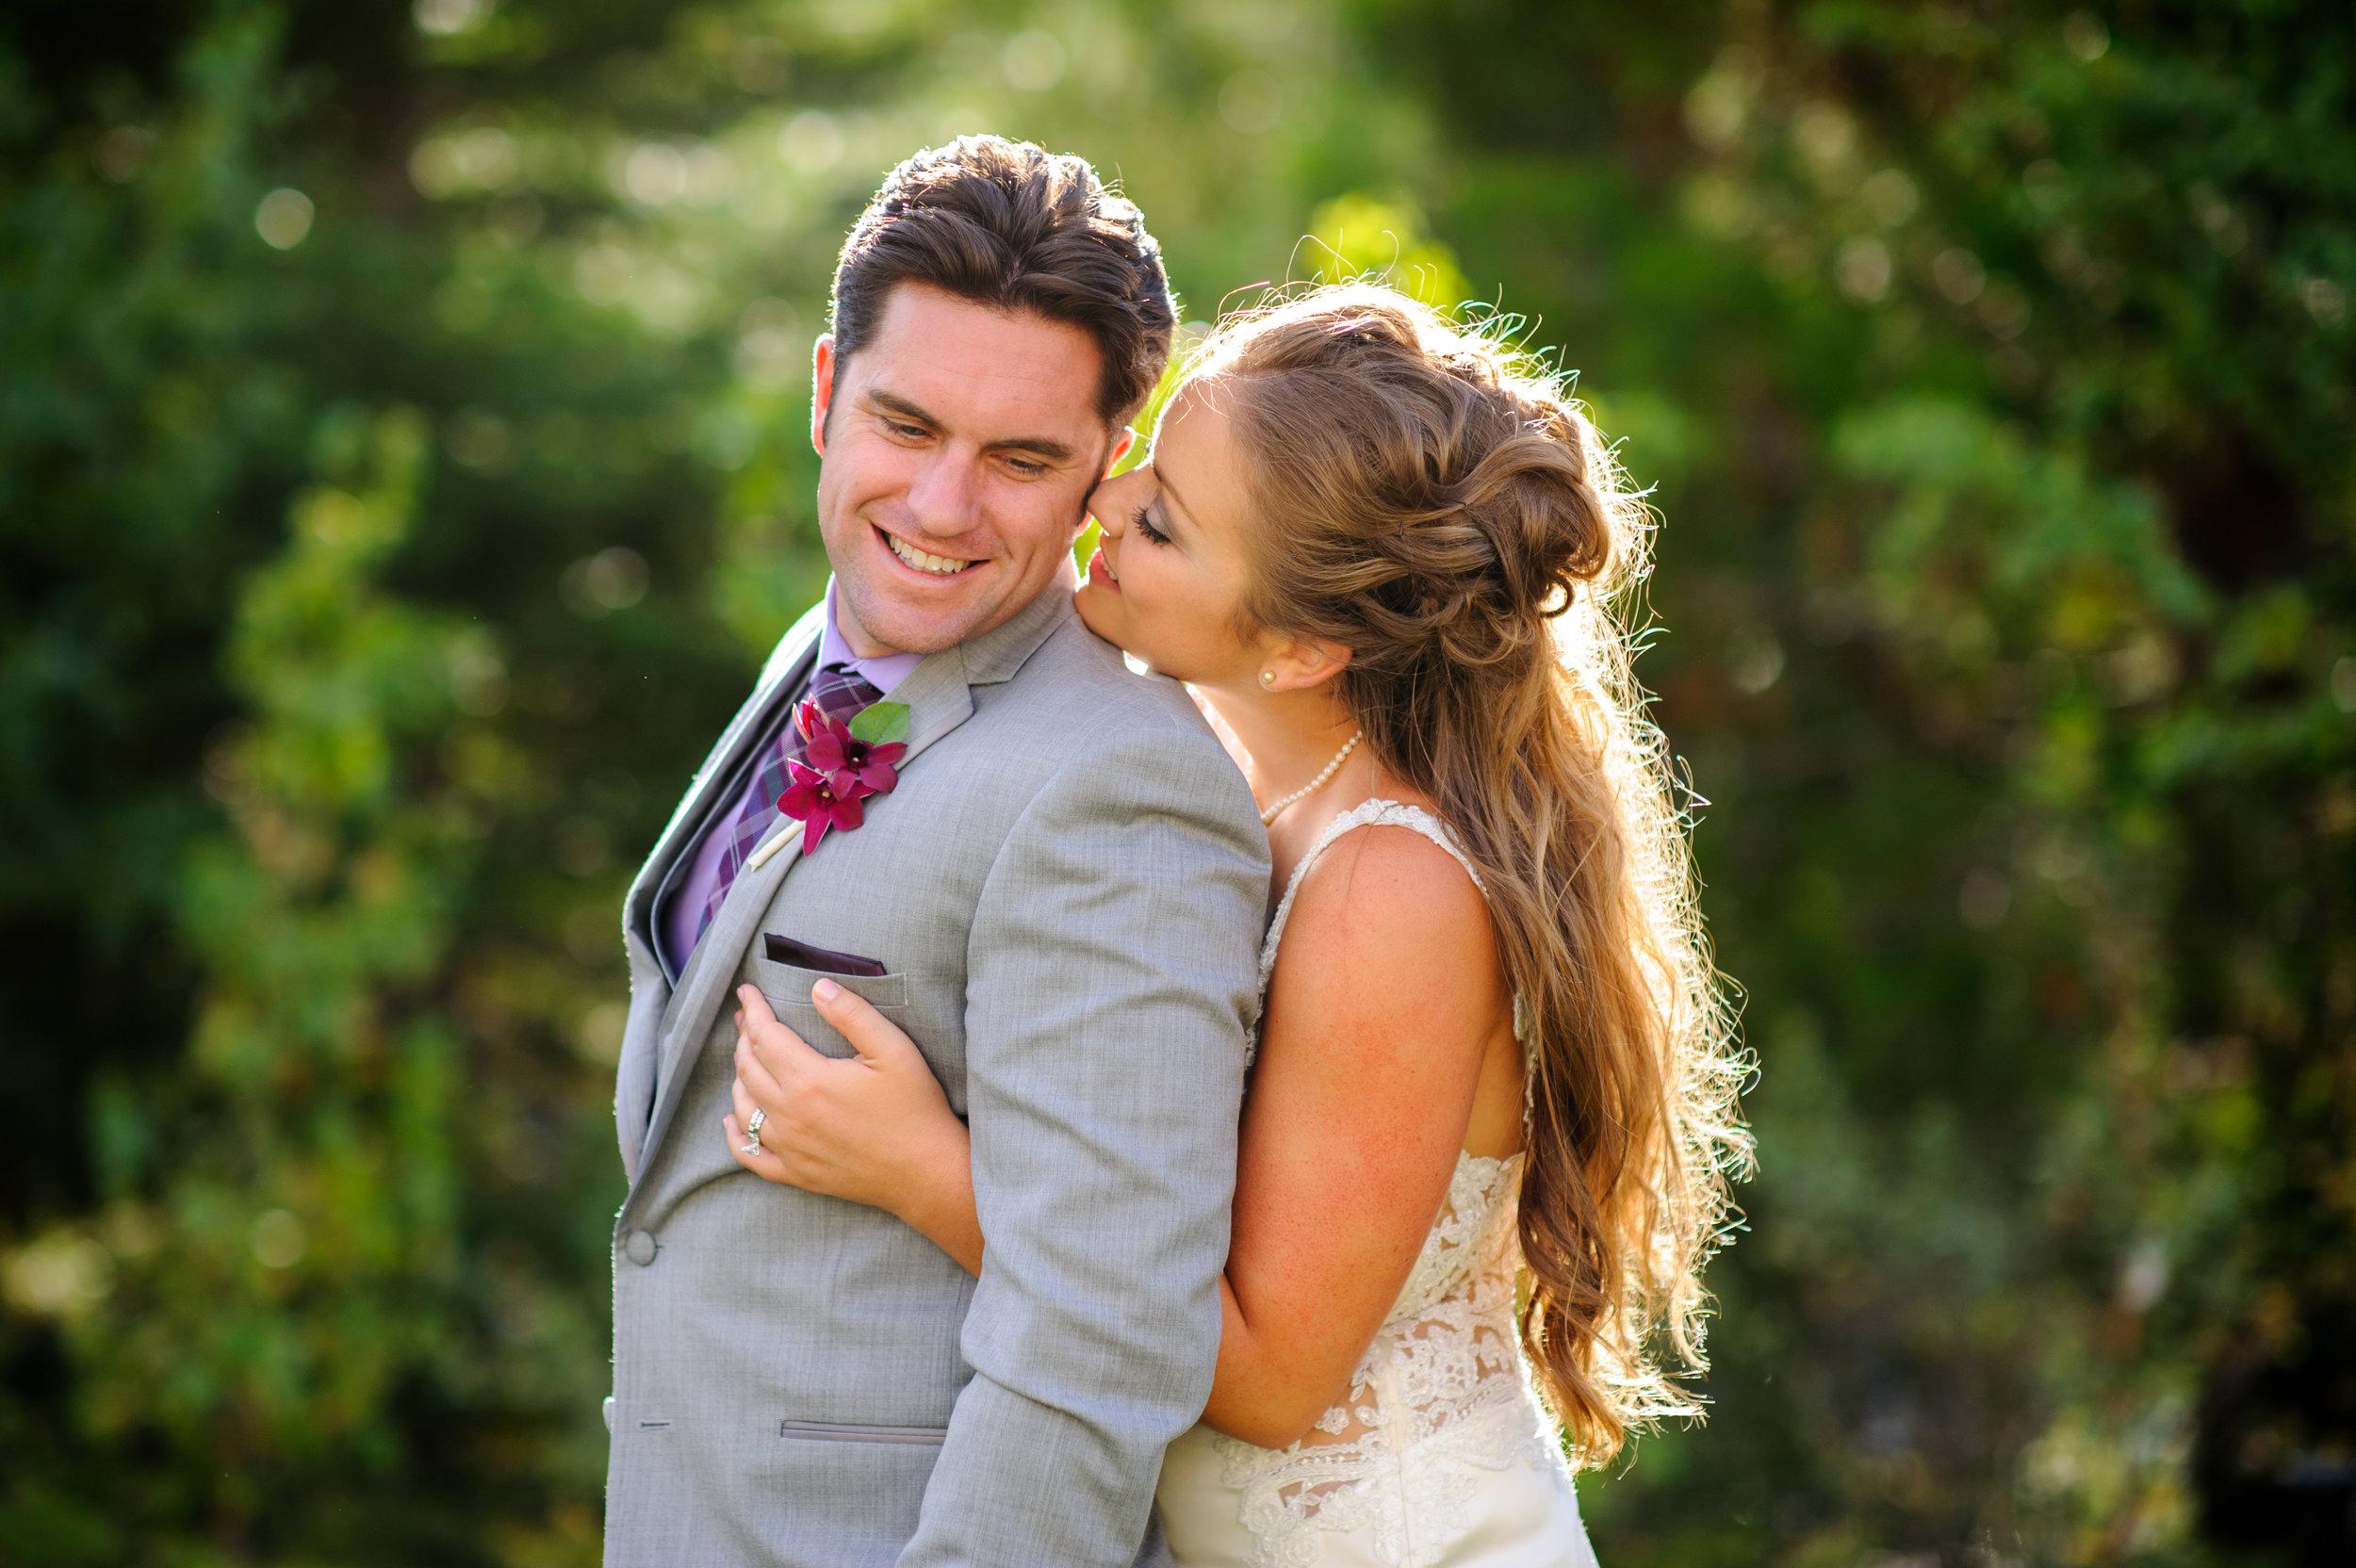 becca-jacob-025-tenaya-lodge-yosemite-wedding-photographer-katherine-nicole-photography.JPG